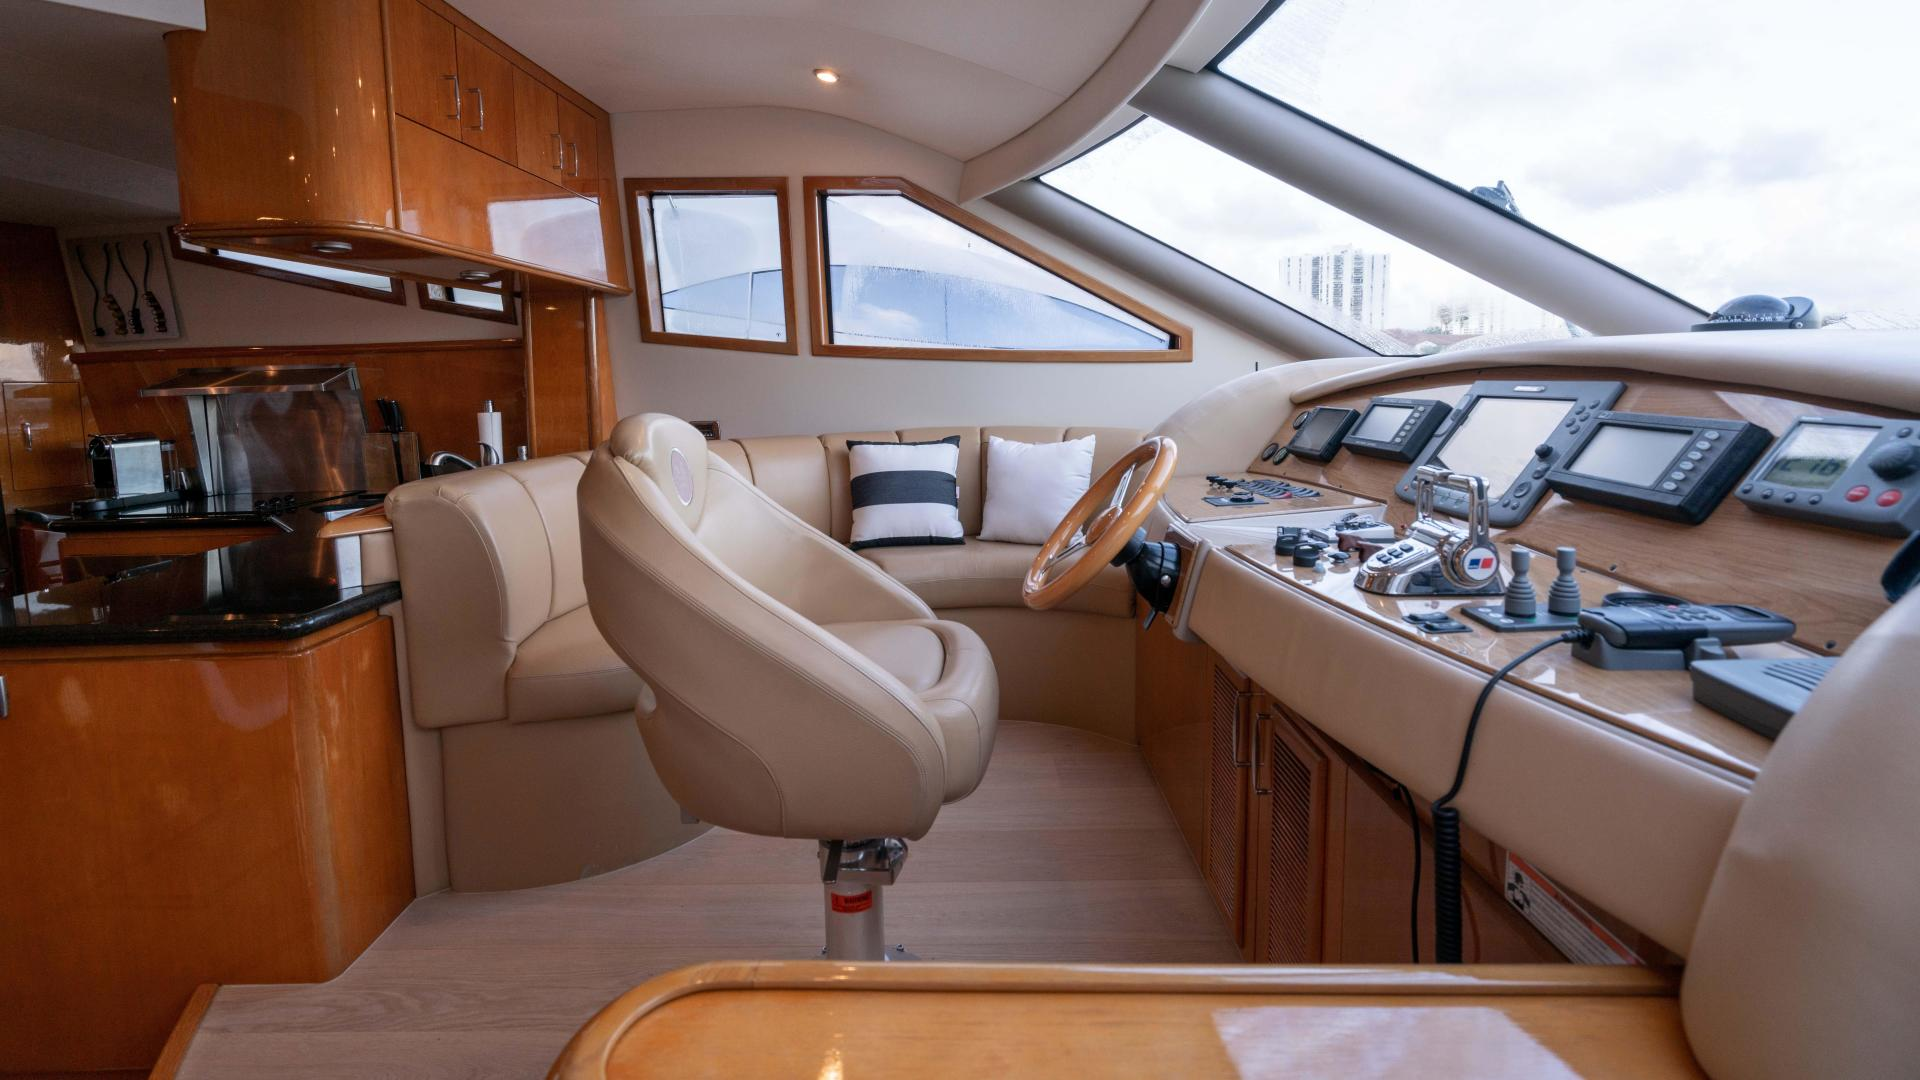 Marquis-690 2007-MINX Aventura-Florida-United States-1492611   Thumbnail